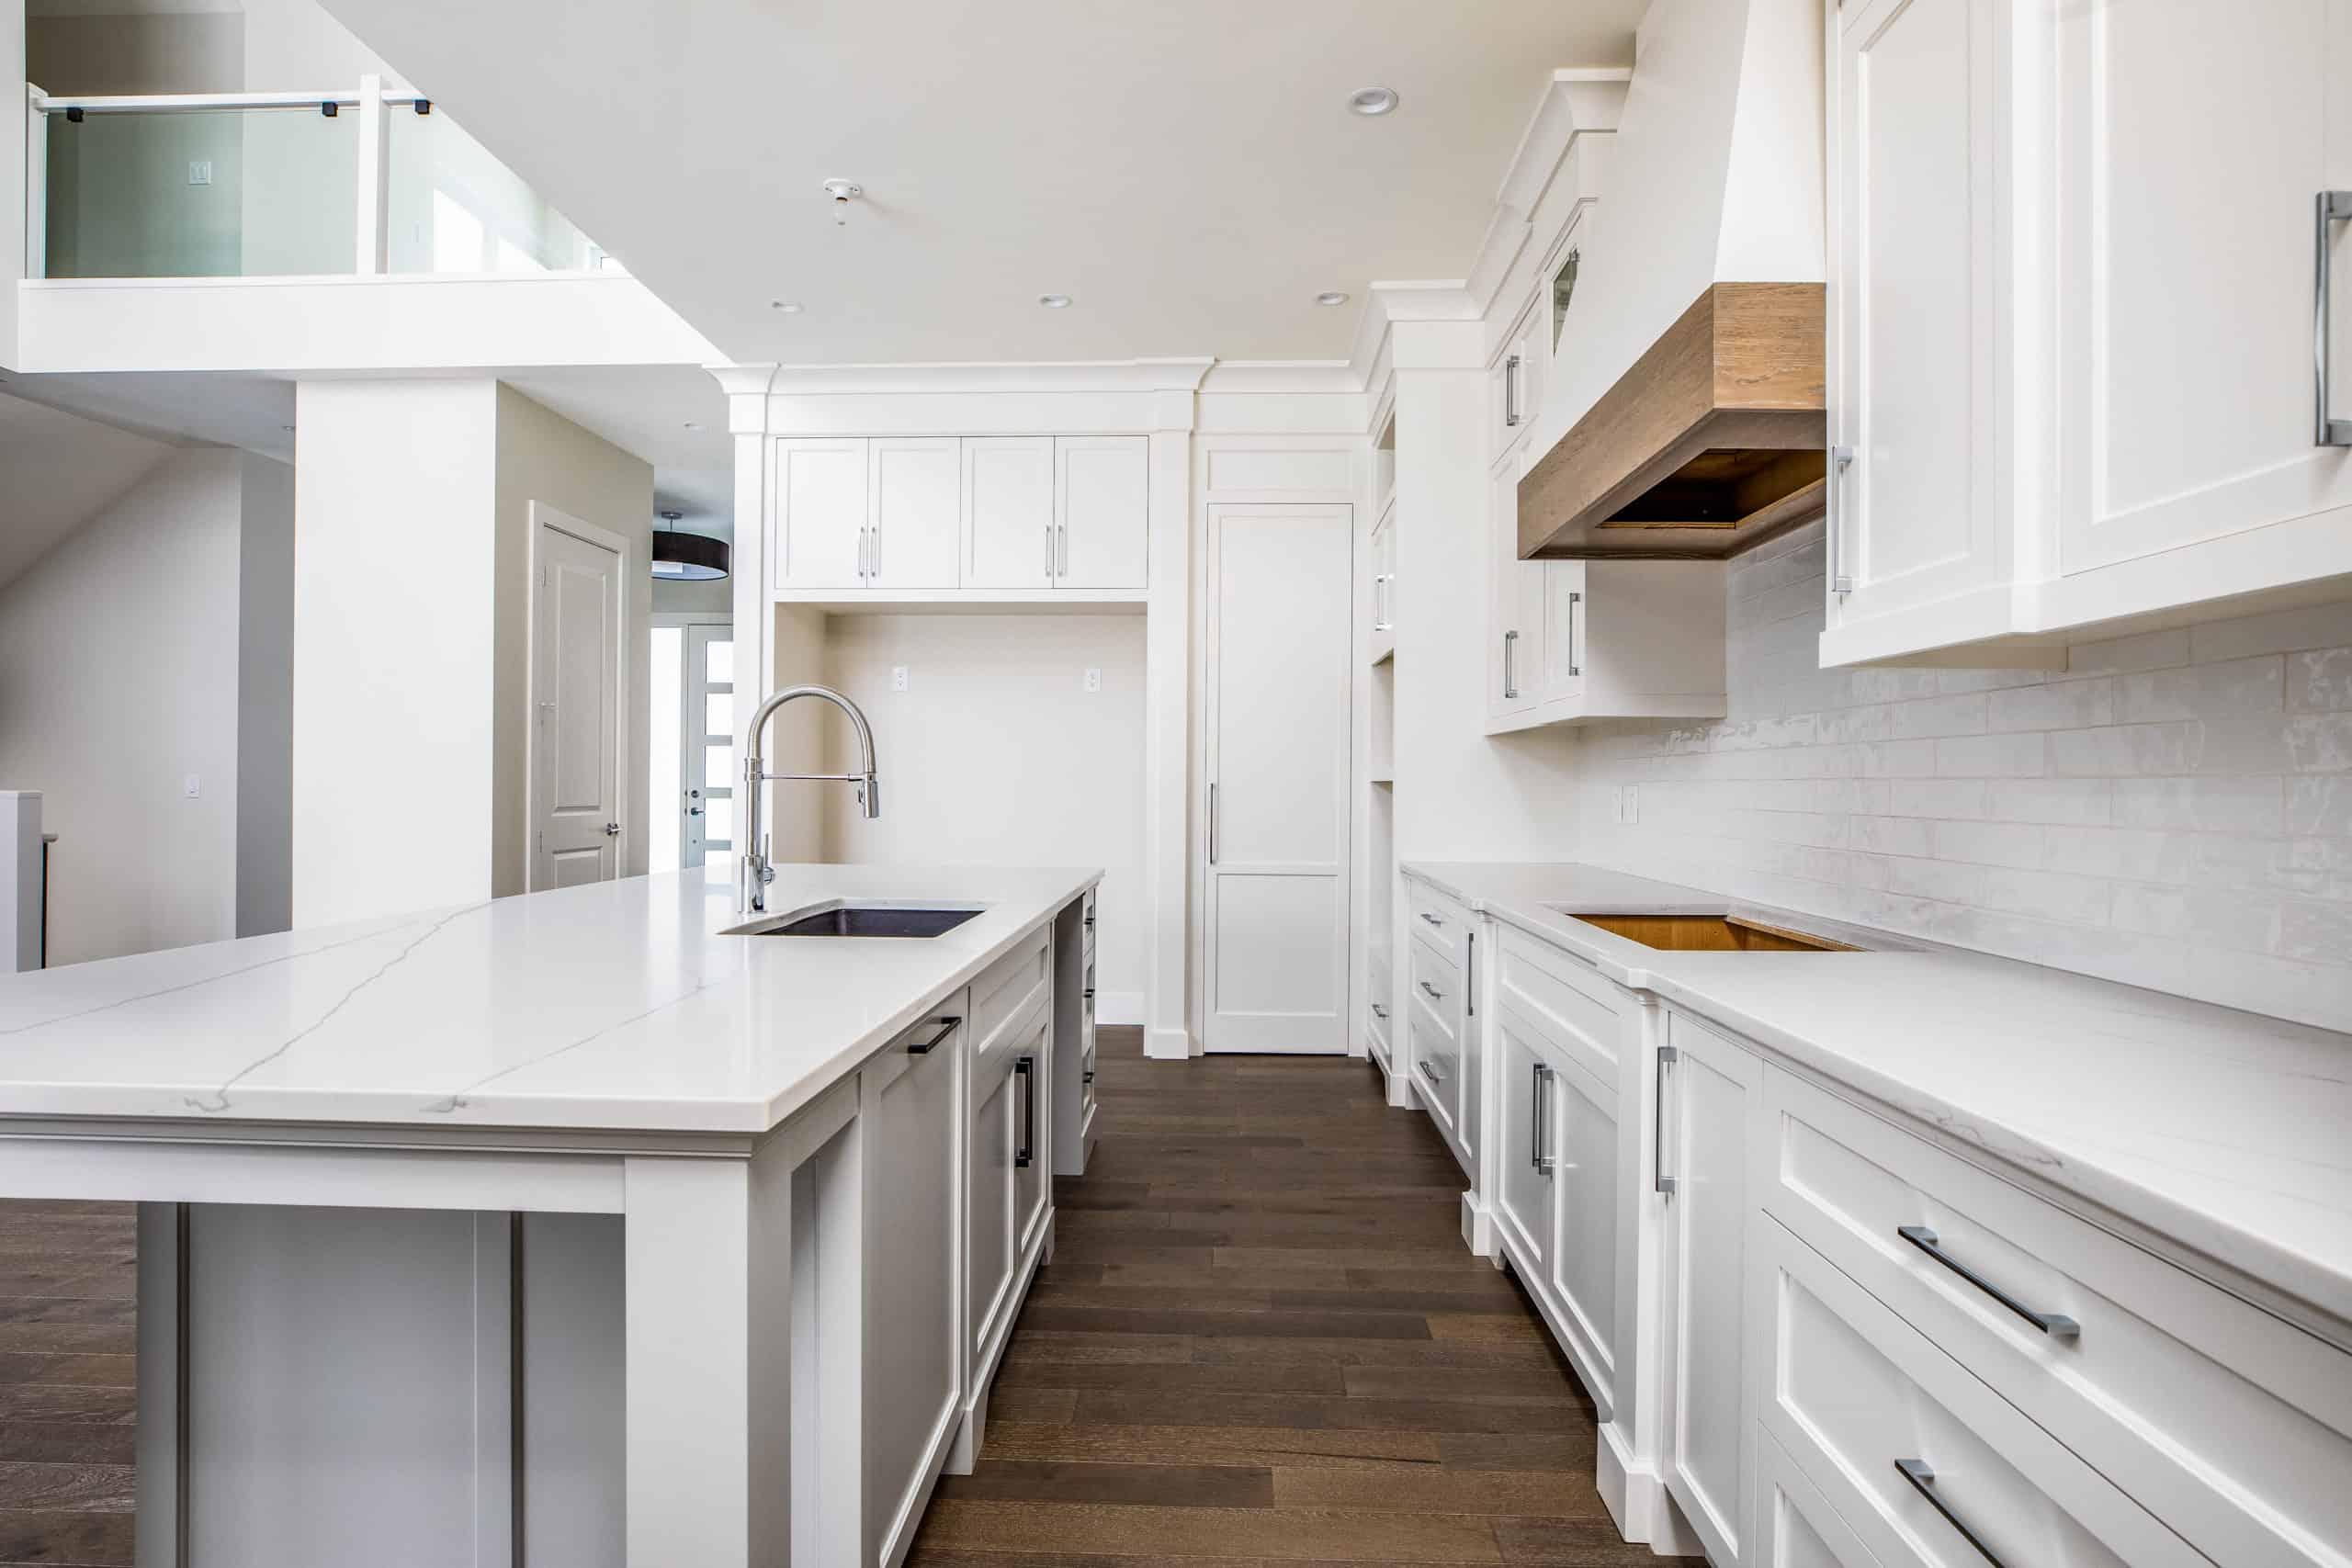 North Glenmore Park Modern Bungalow Kitchen